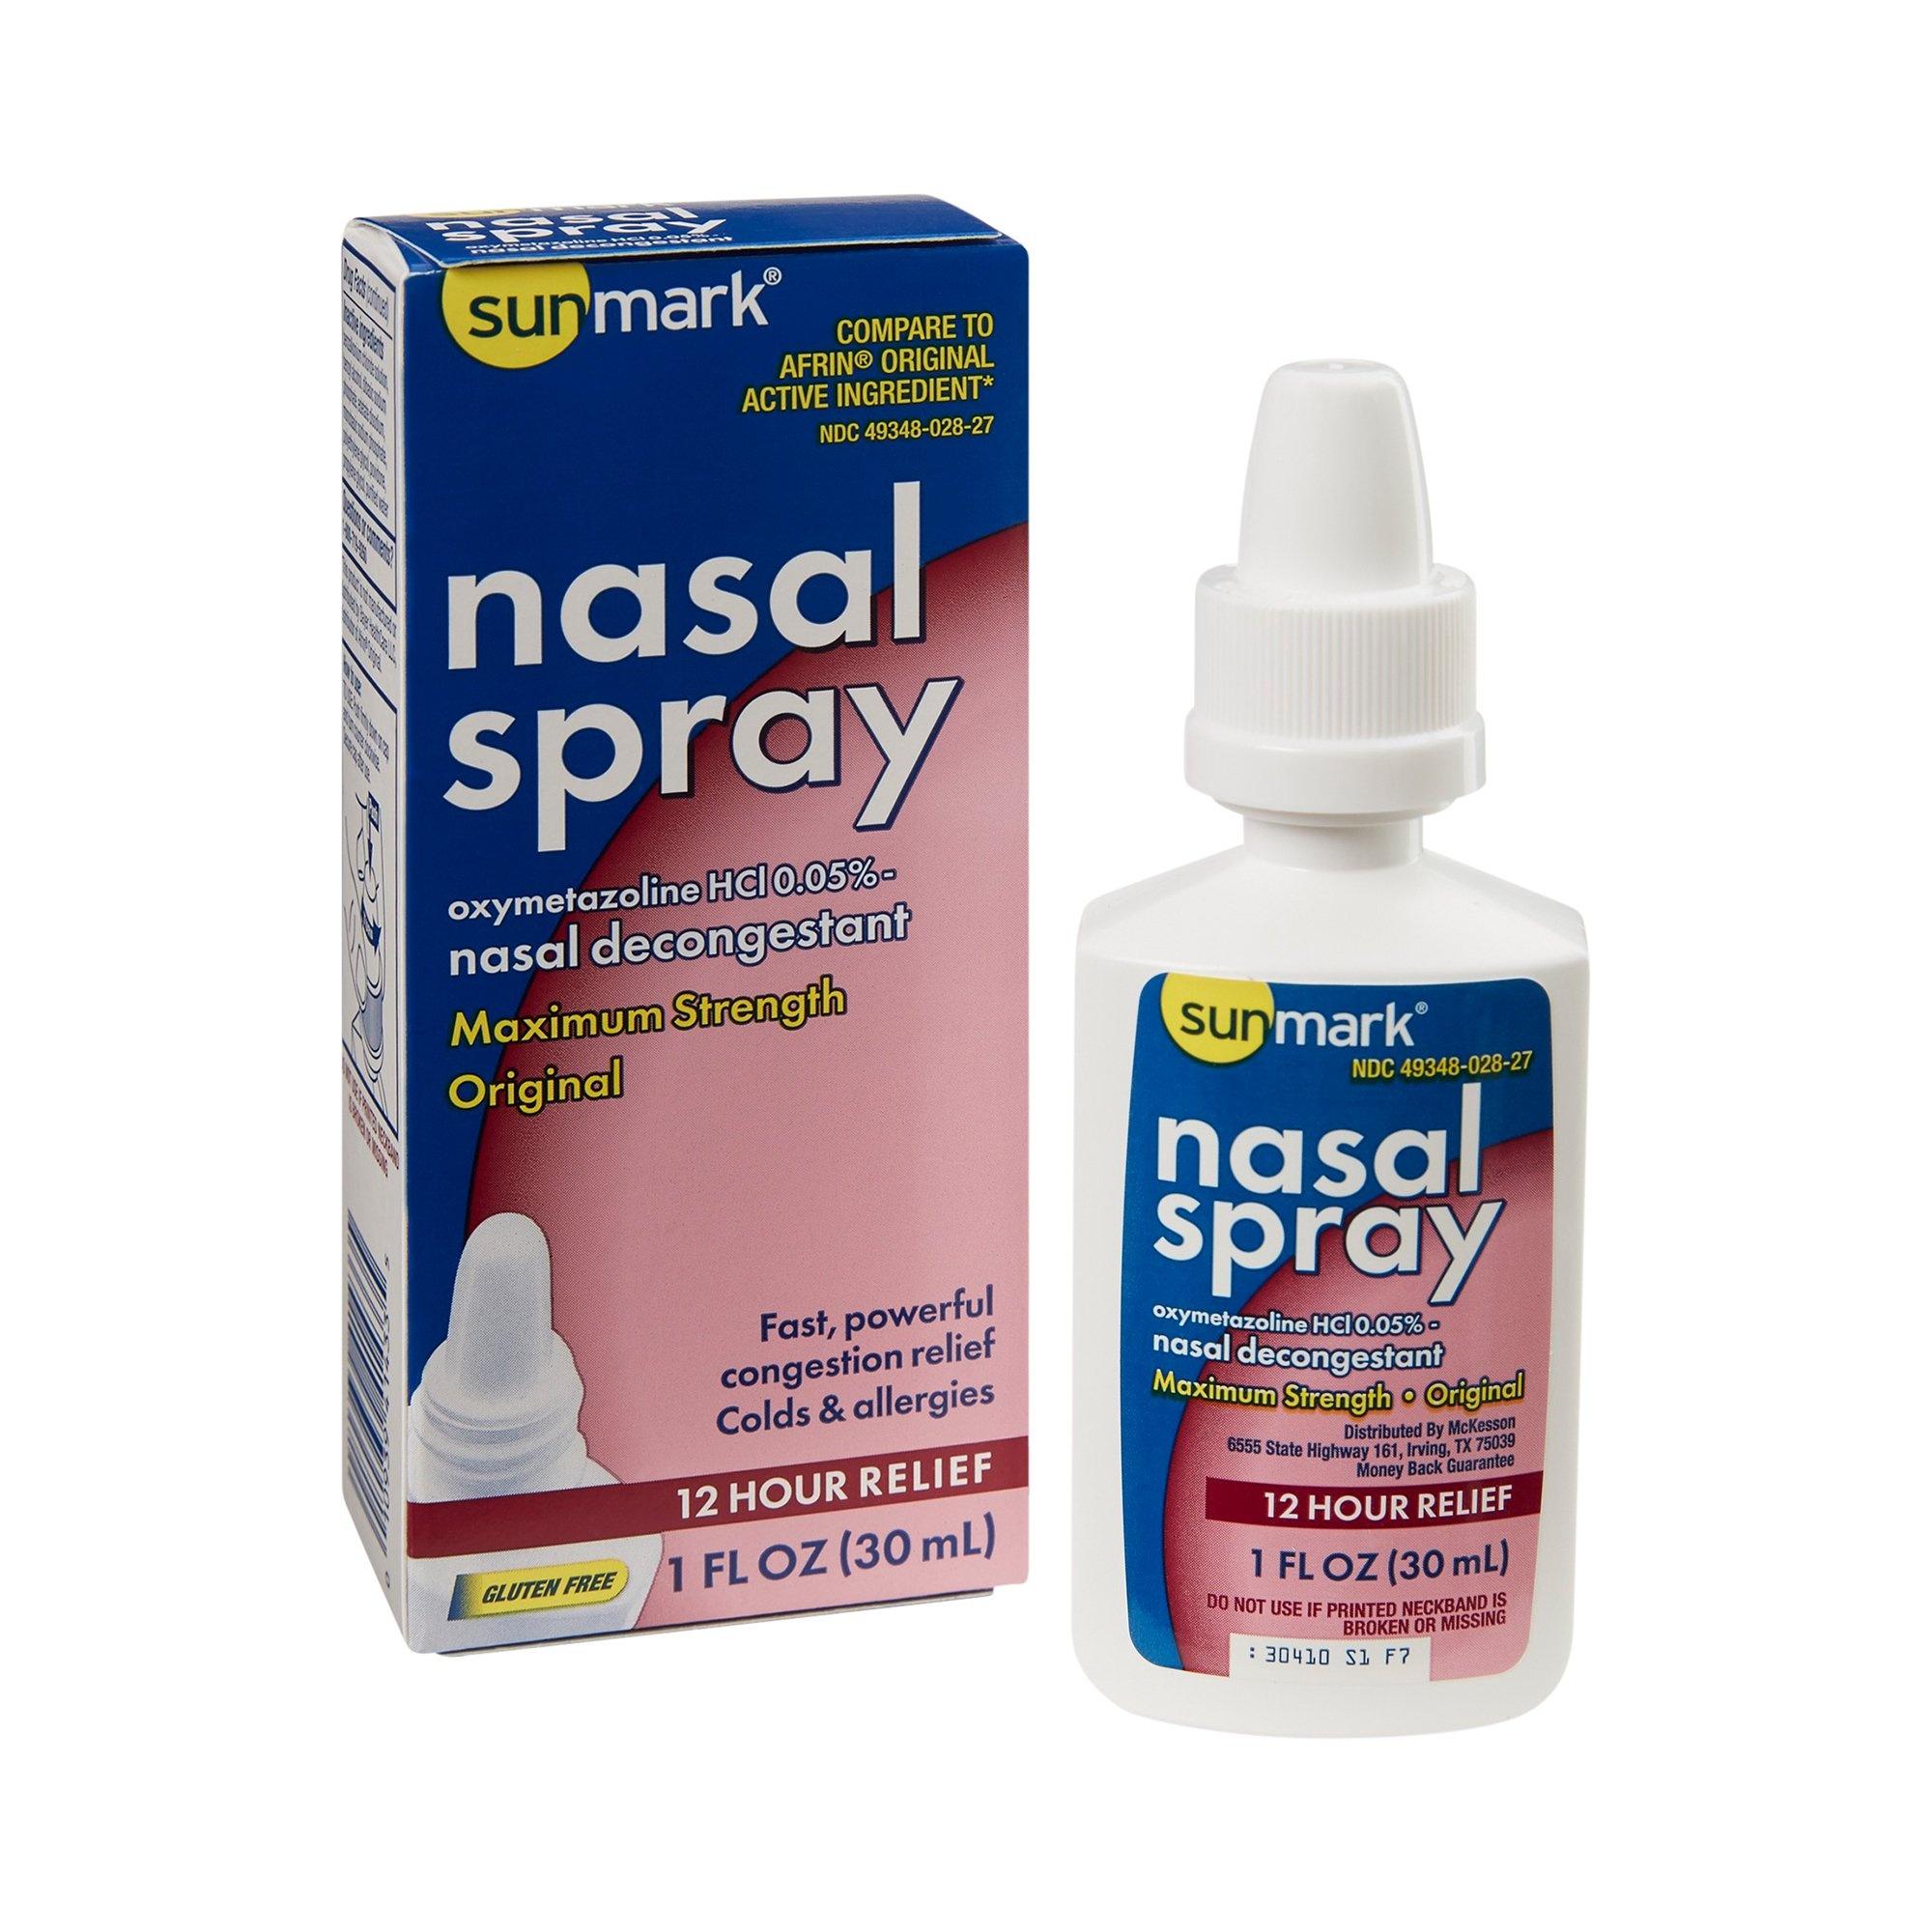 sunmark Maximum Strength Oxymetazoline HCl Nasal Spray, 1 oz., 49348002827, 1 Bottle